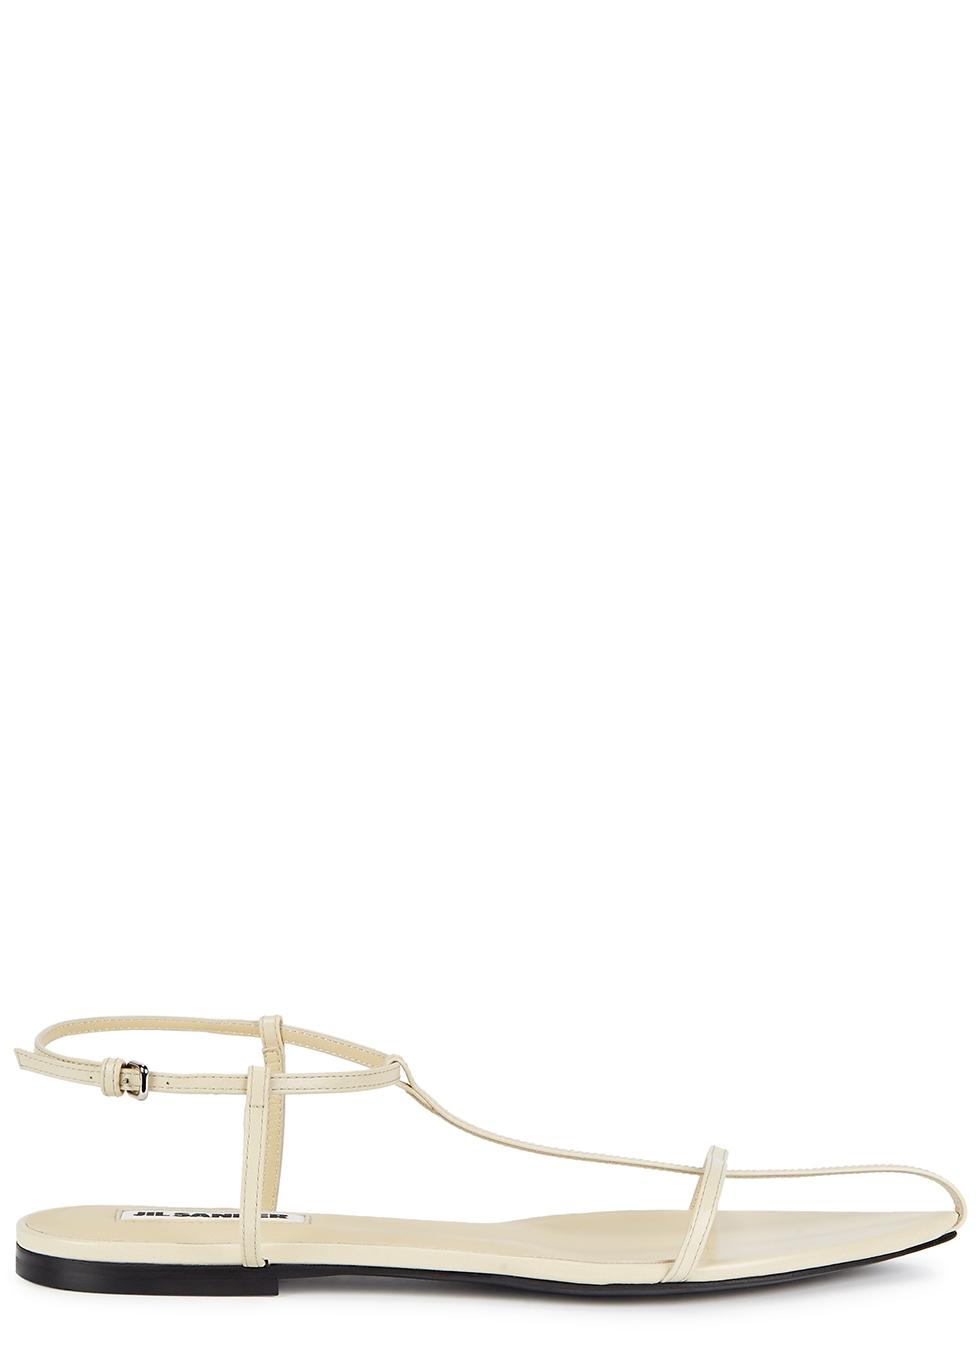 Jil Sander Pale yellow leather sandals